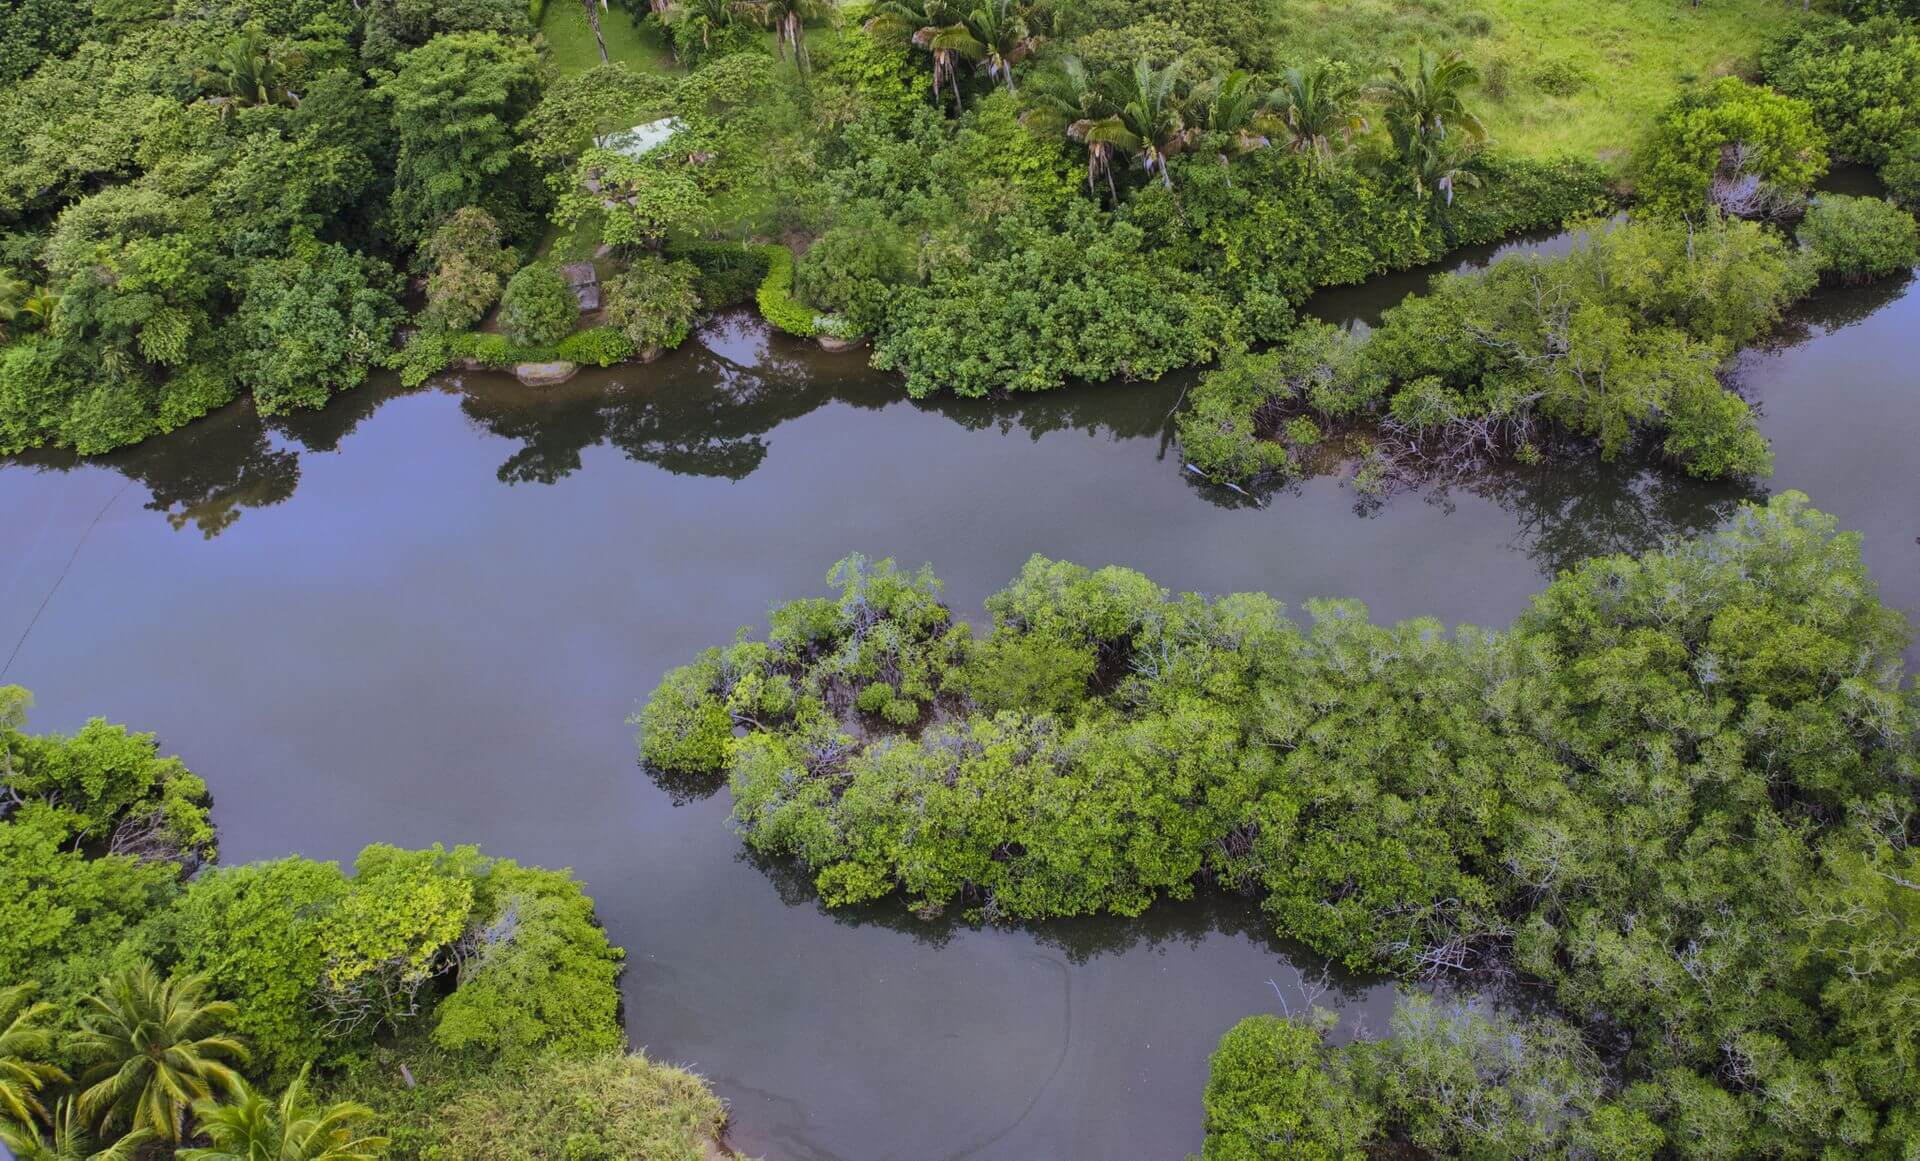 Barrigona Sustainable Nature Costa Rica